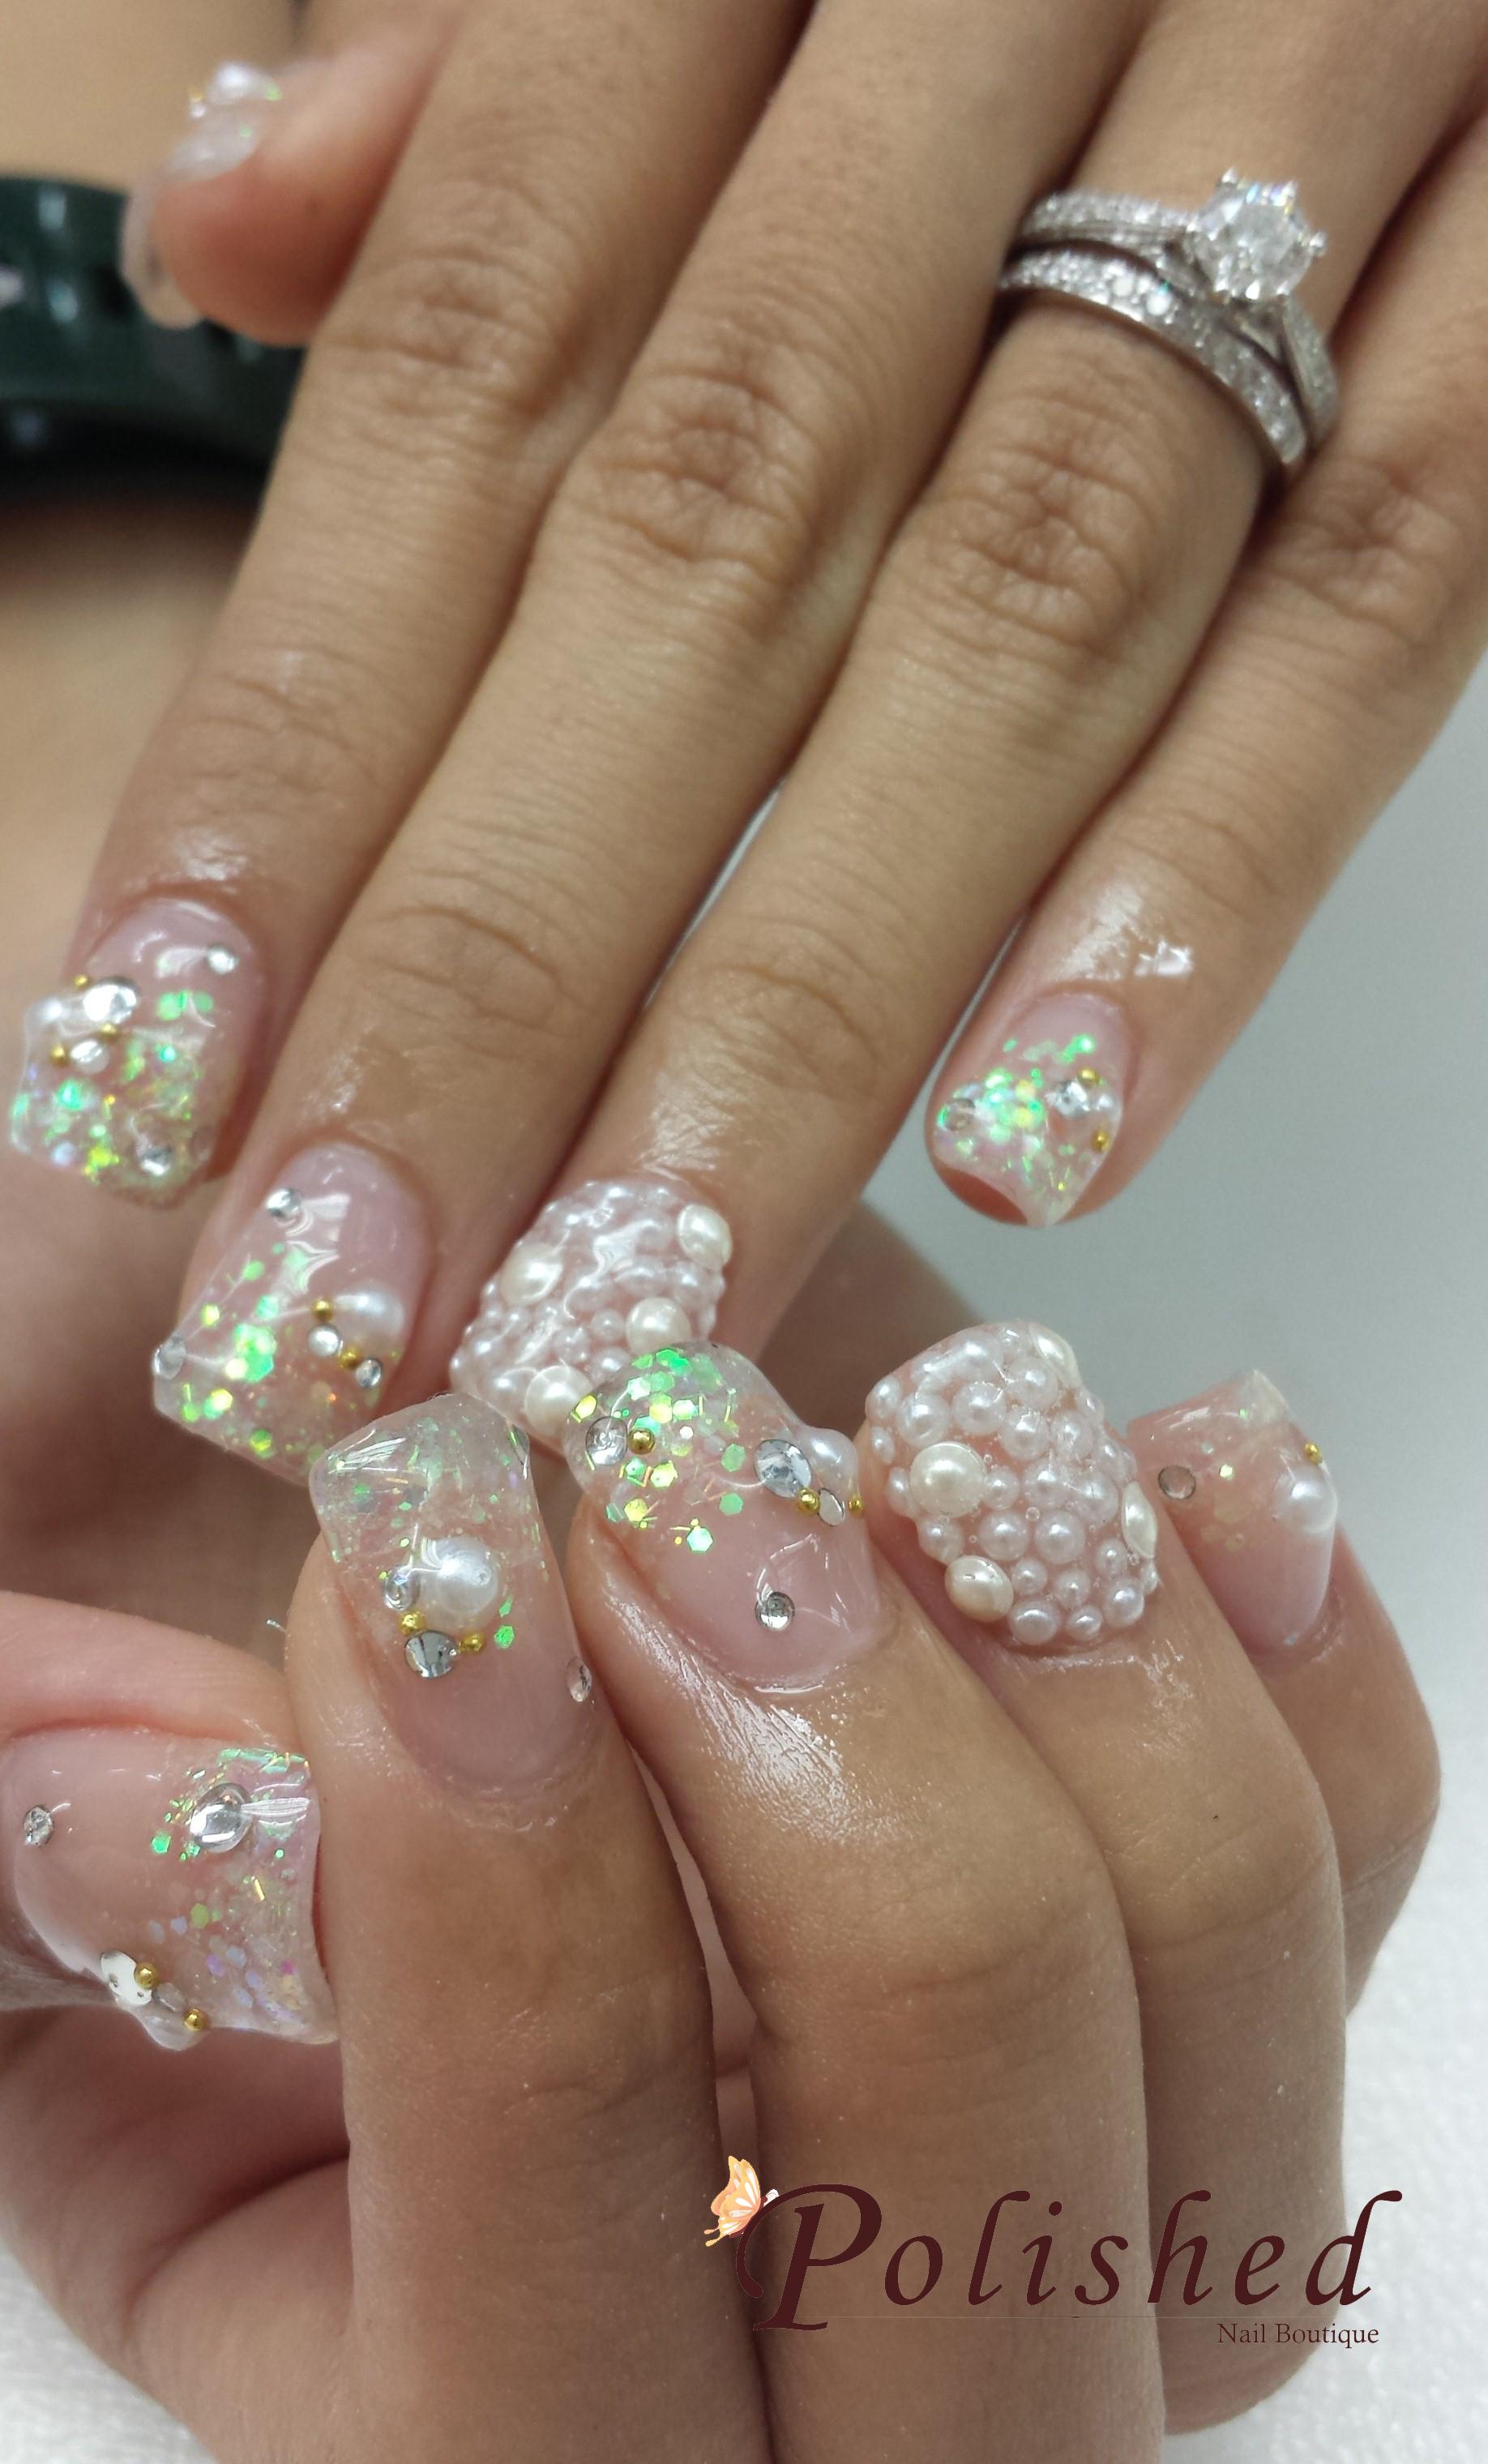 Wedding Nails using OPI Gel Polish - Nail Art Design Ideas Collection